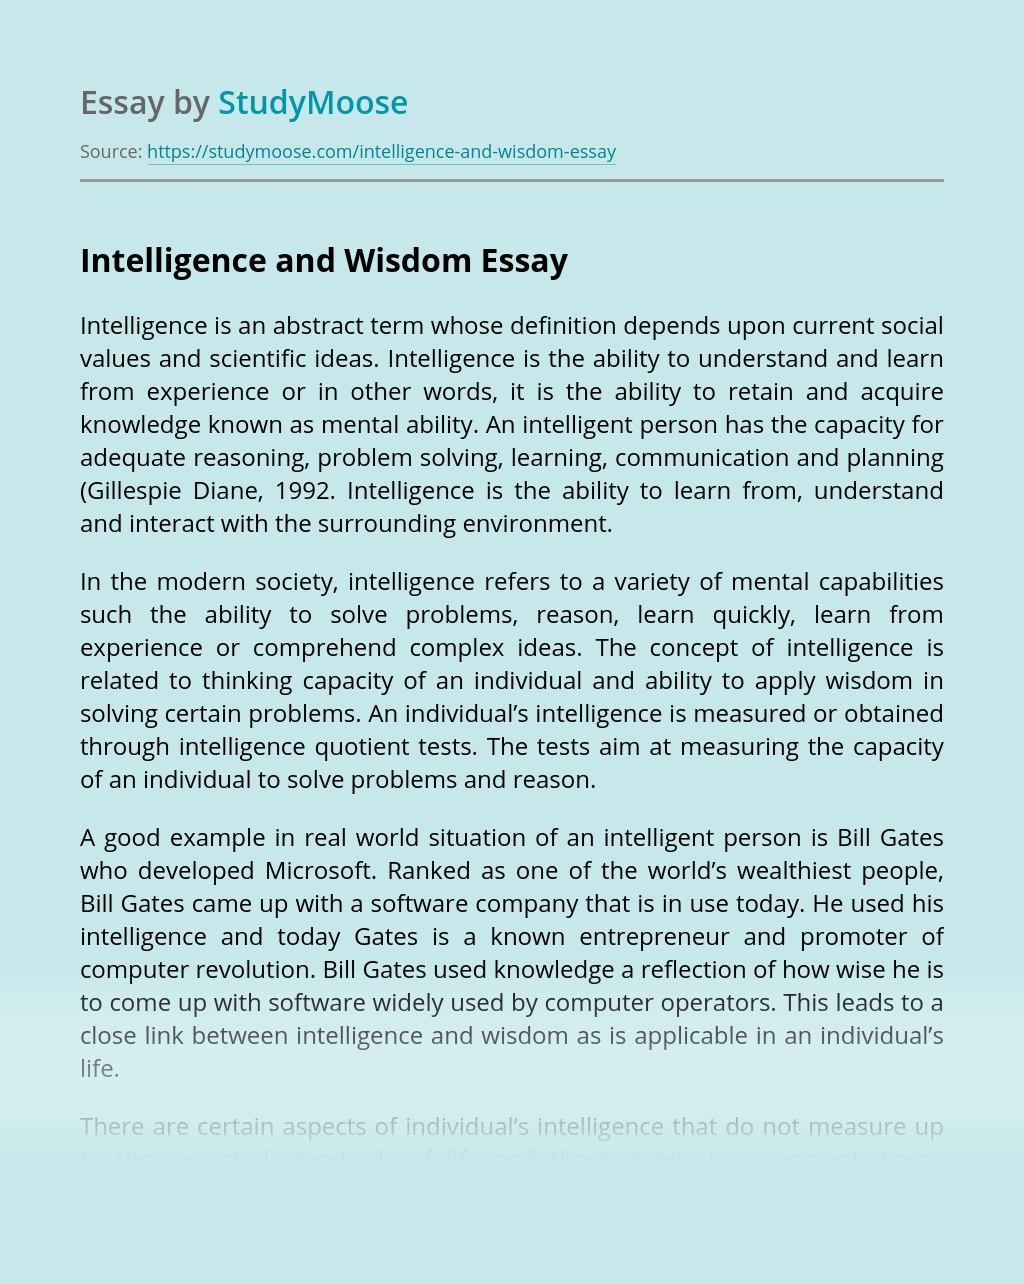 Intelligence and Wisdom